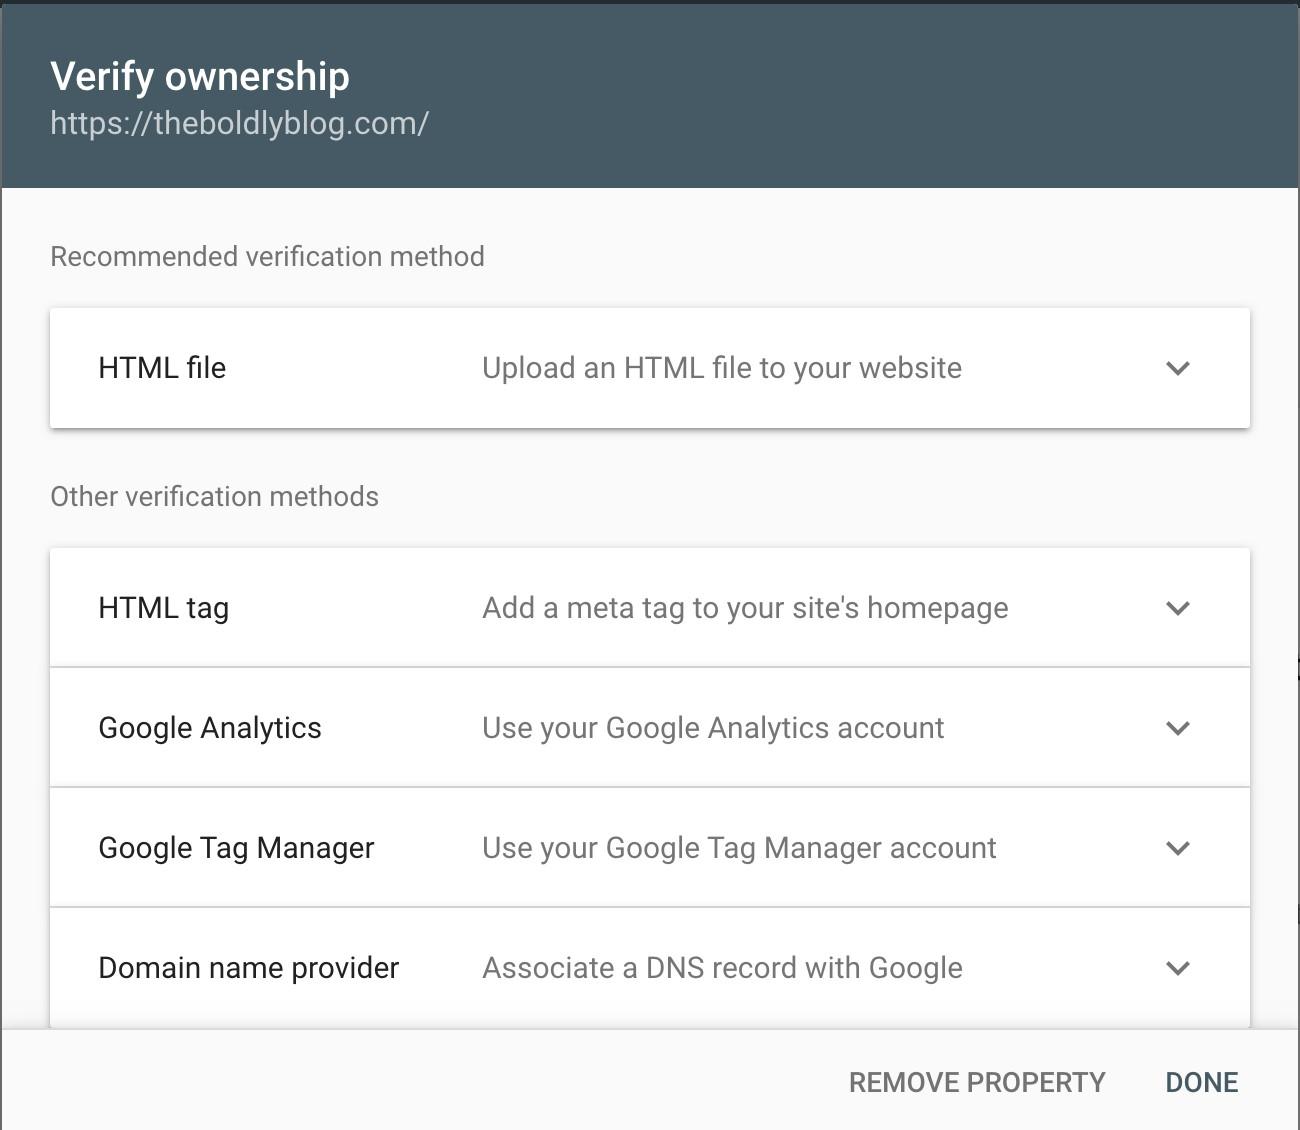 gsc-verify-ownership